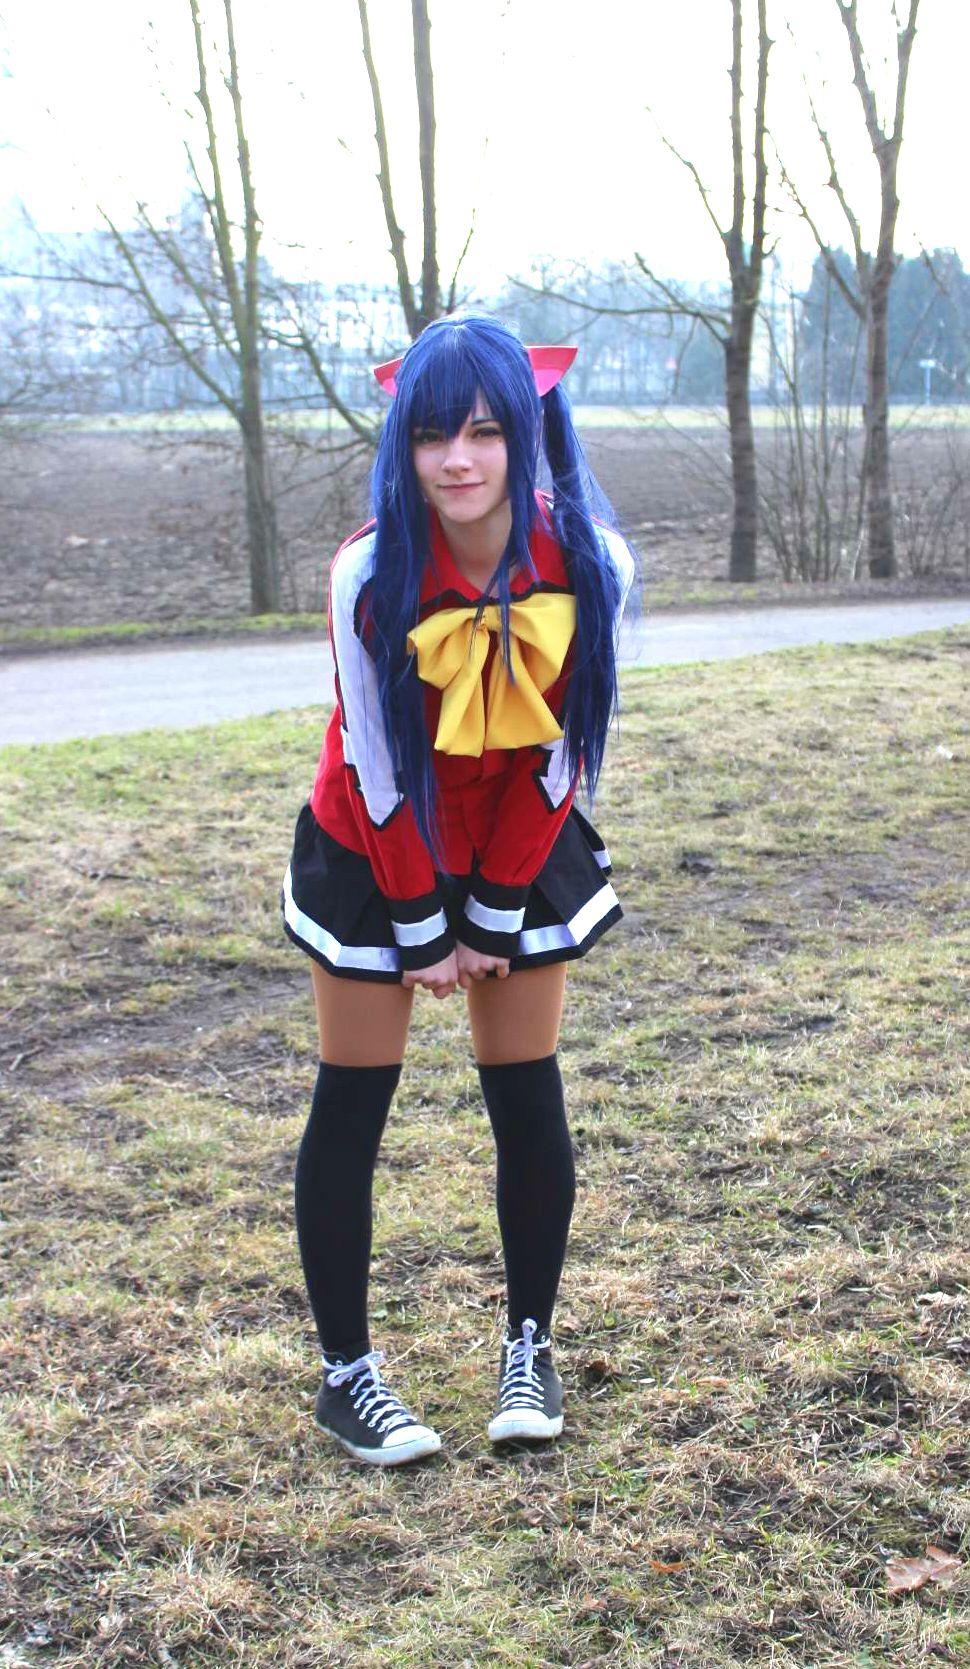 wendy_marvell__edolas_clothes__cosplay_by_anitramnoriko-d8l2mx9.jpg (970×1669)